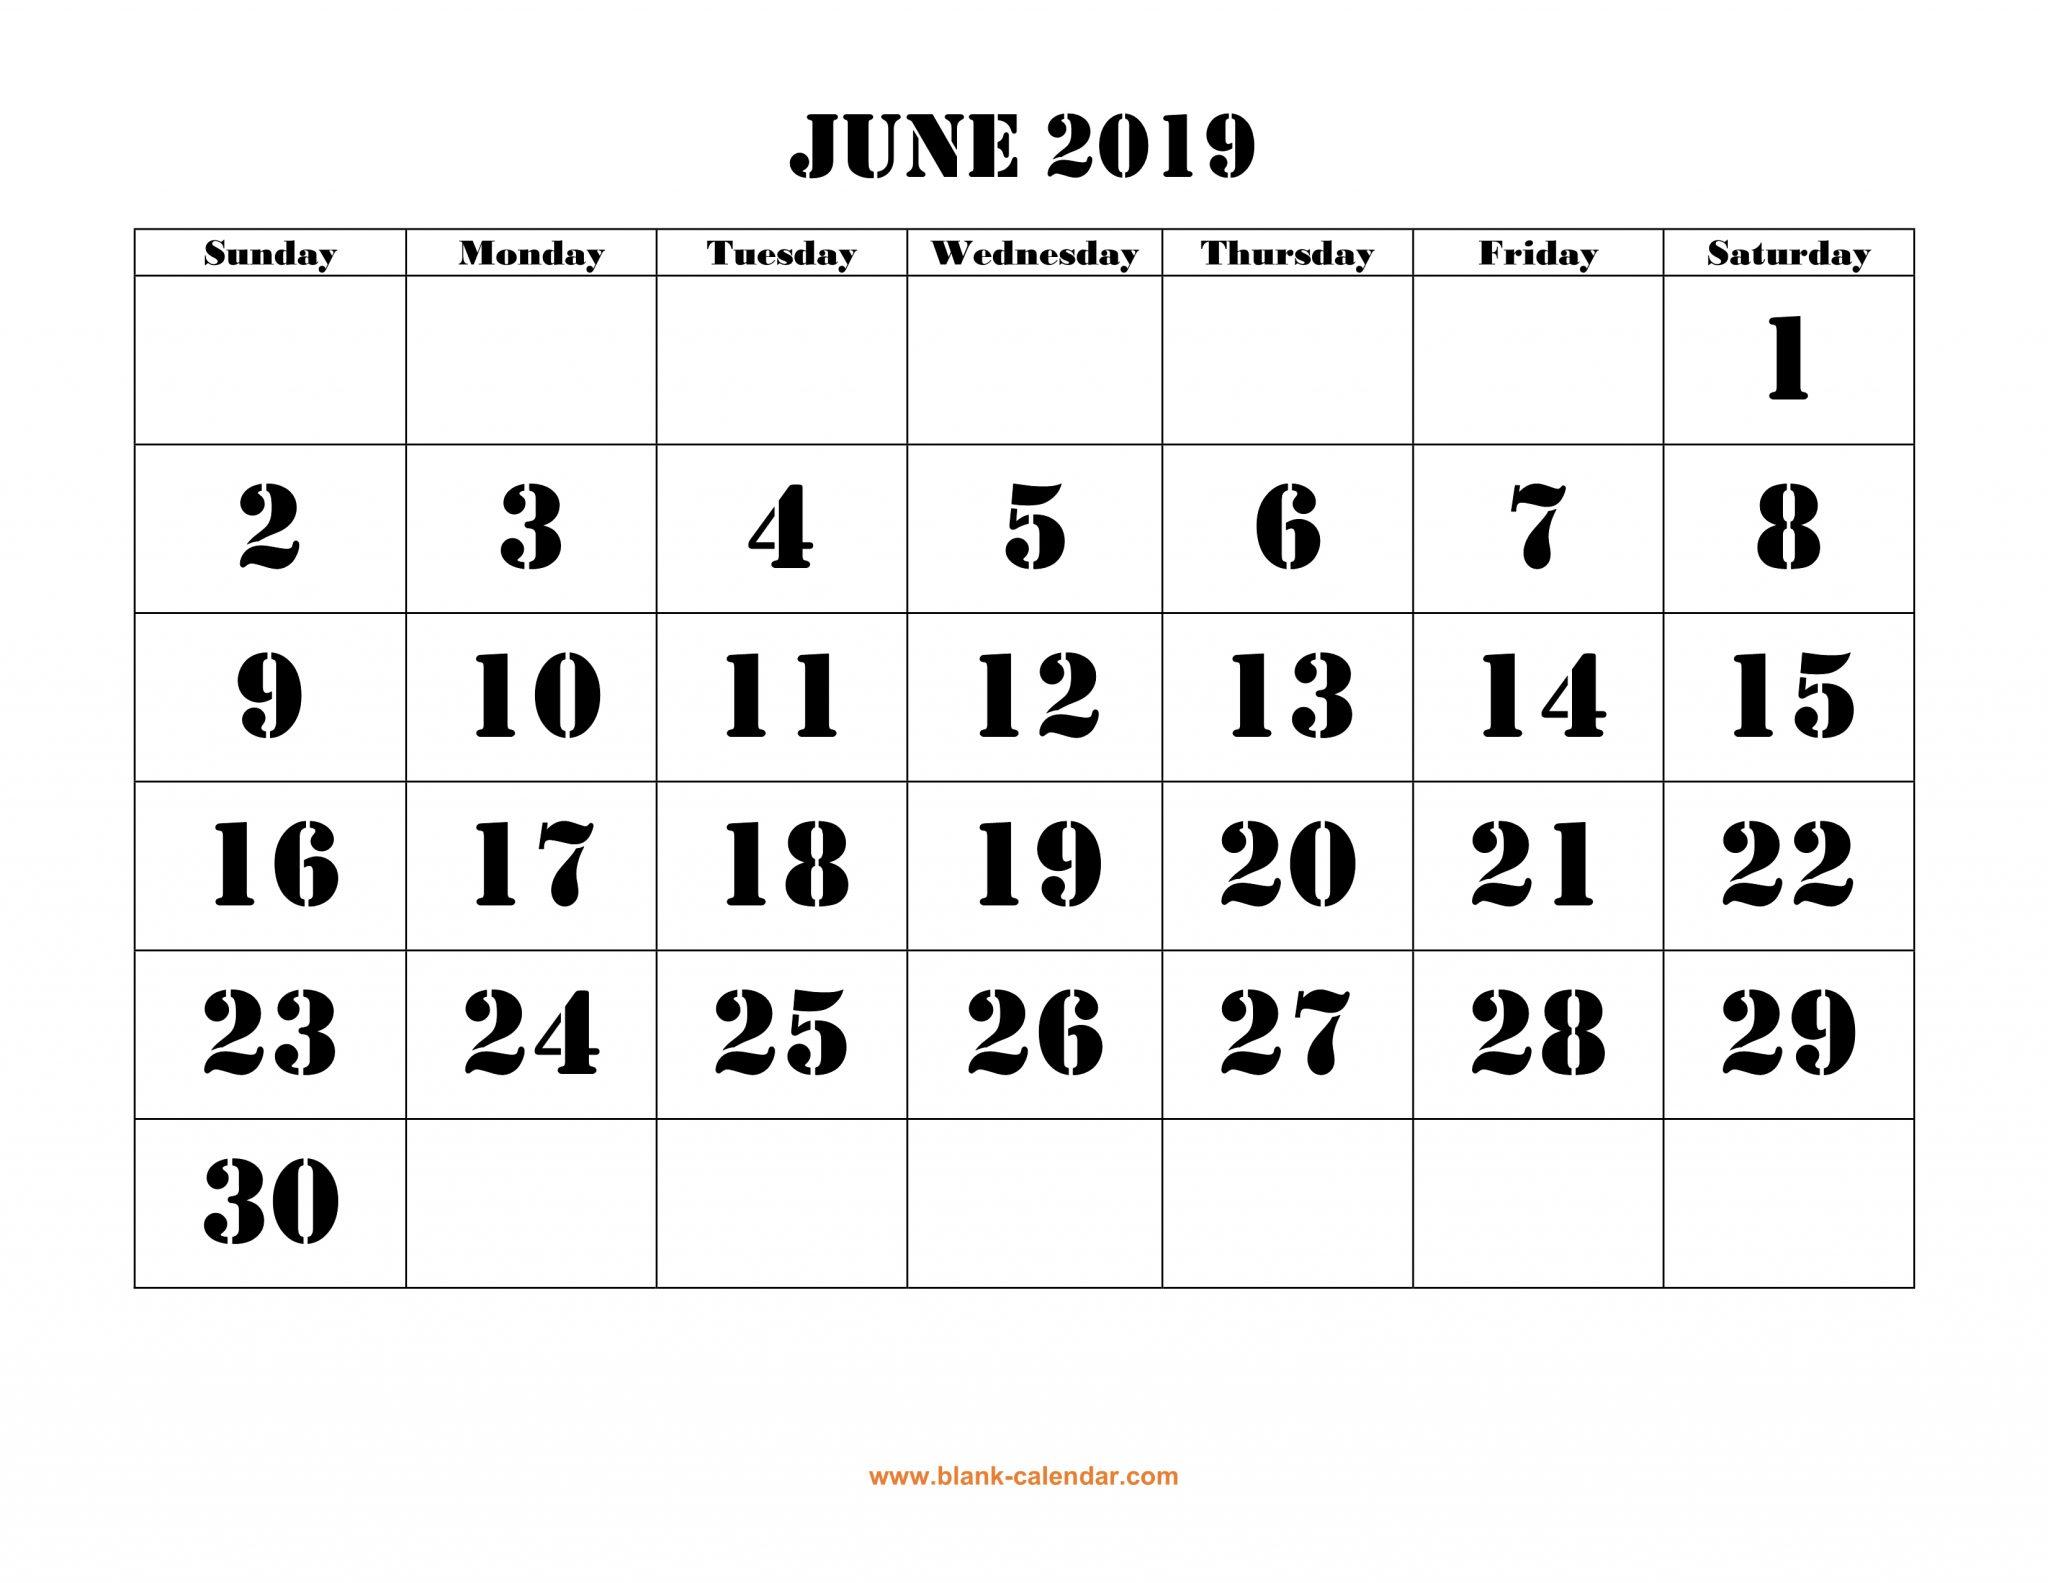 Blank Calendar June 2019